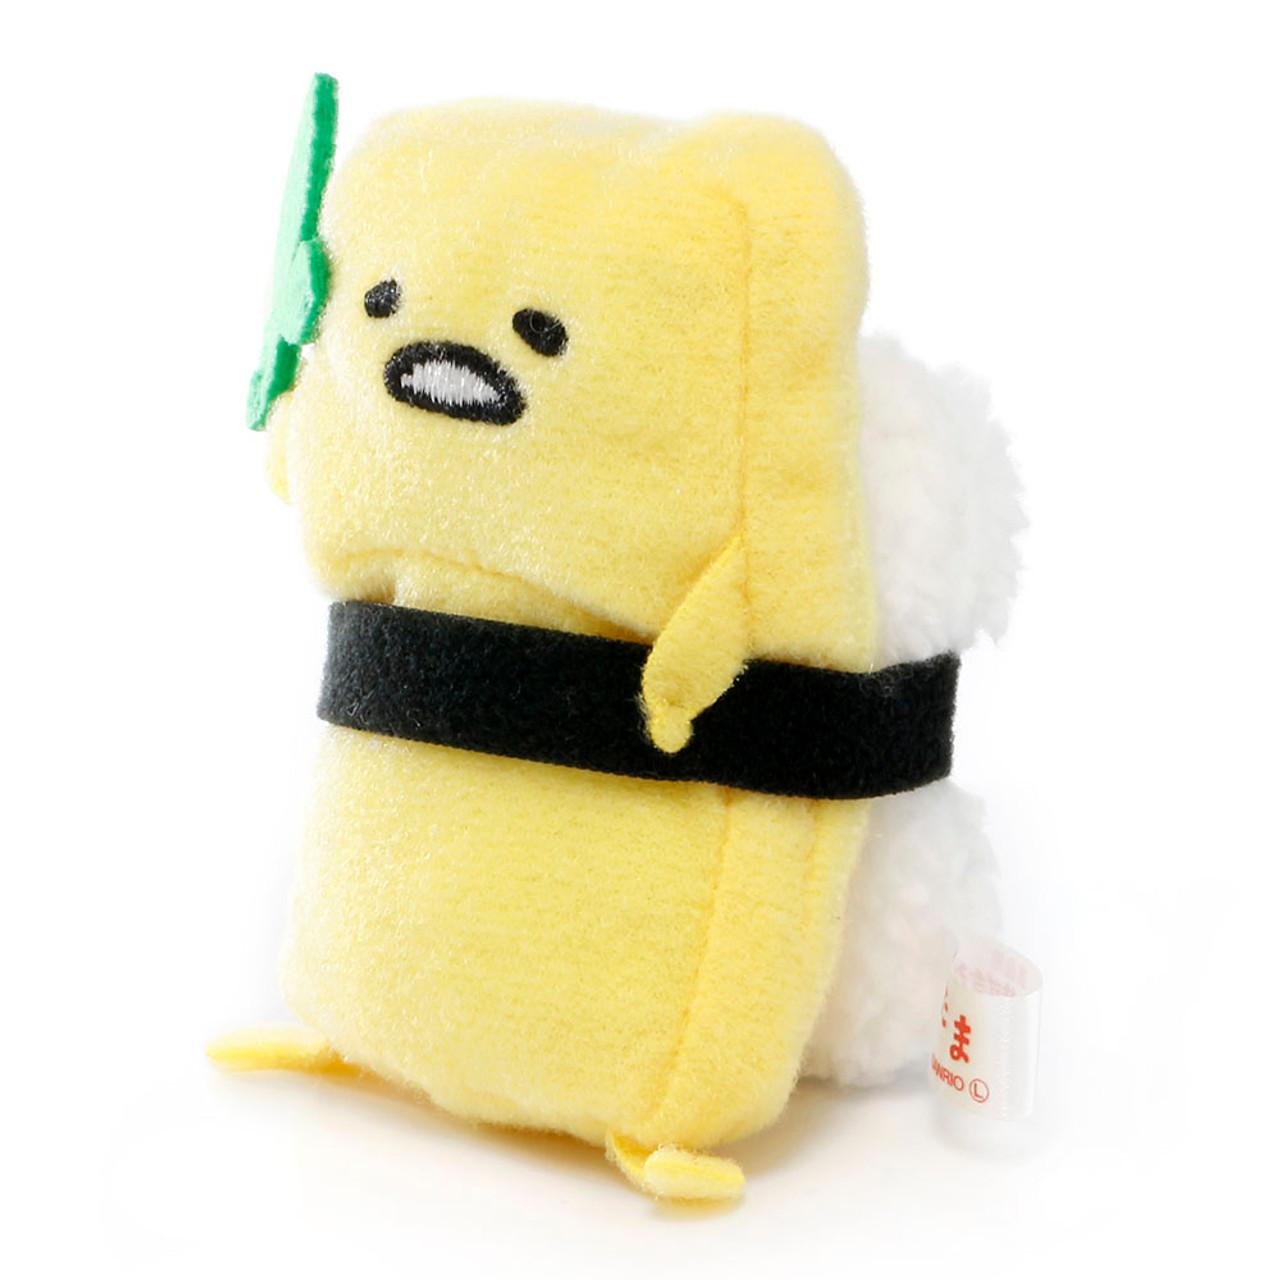 Sanrio Gudetama Lazy Egg Sushi Mascot Plush Charms - Japan Scrambled Sushi ( Side View )